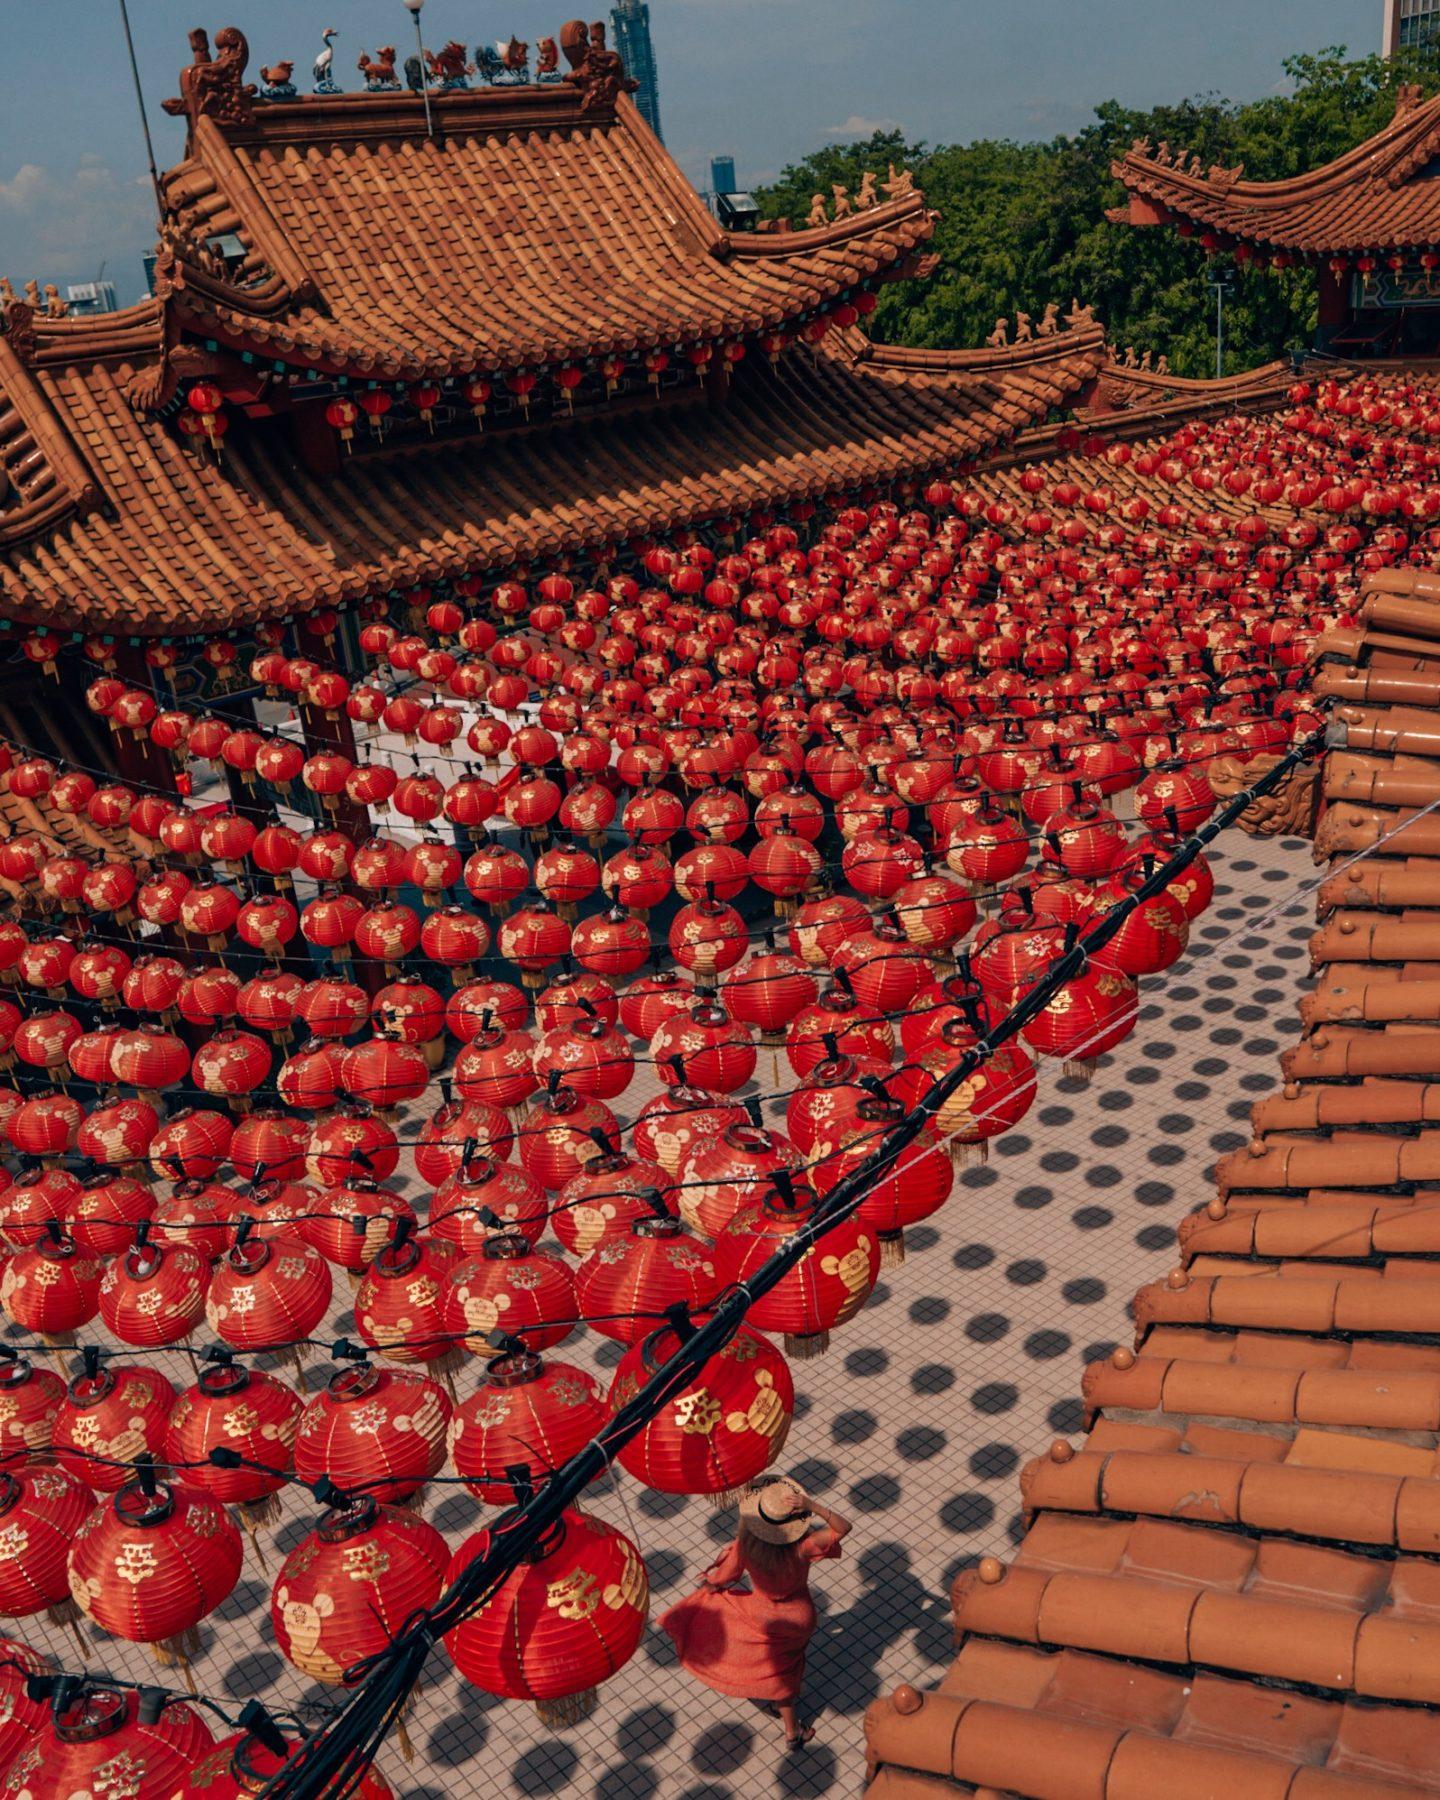 Red lanterns of Thean Hou Temple in Kuala Lumpur